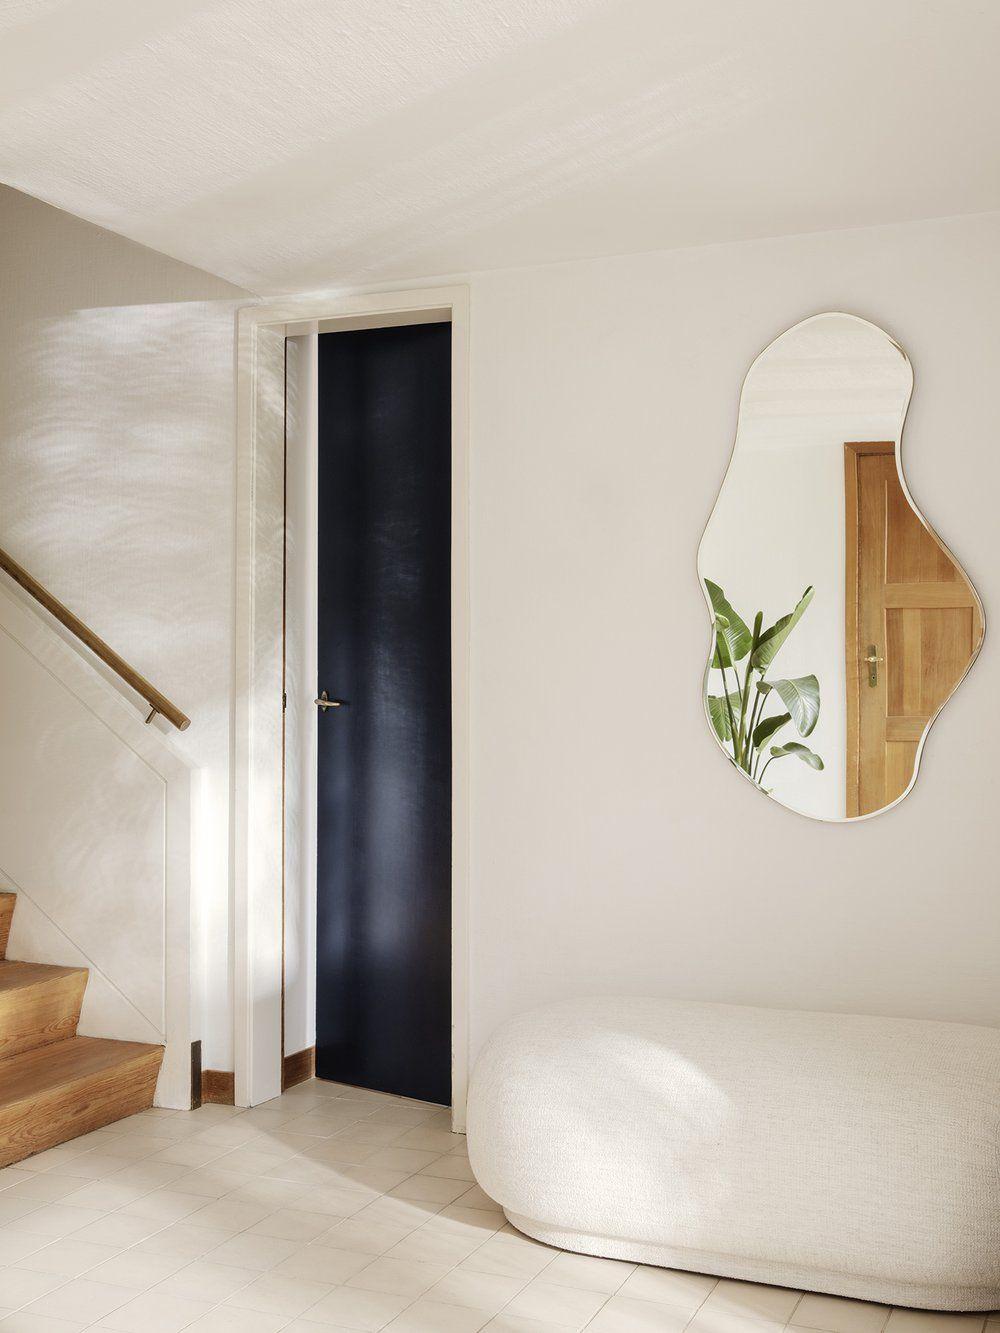 Ferm Living Pond Spiegel Spiegel Interieur Vierkante Spiegels